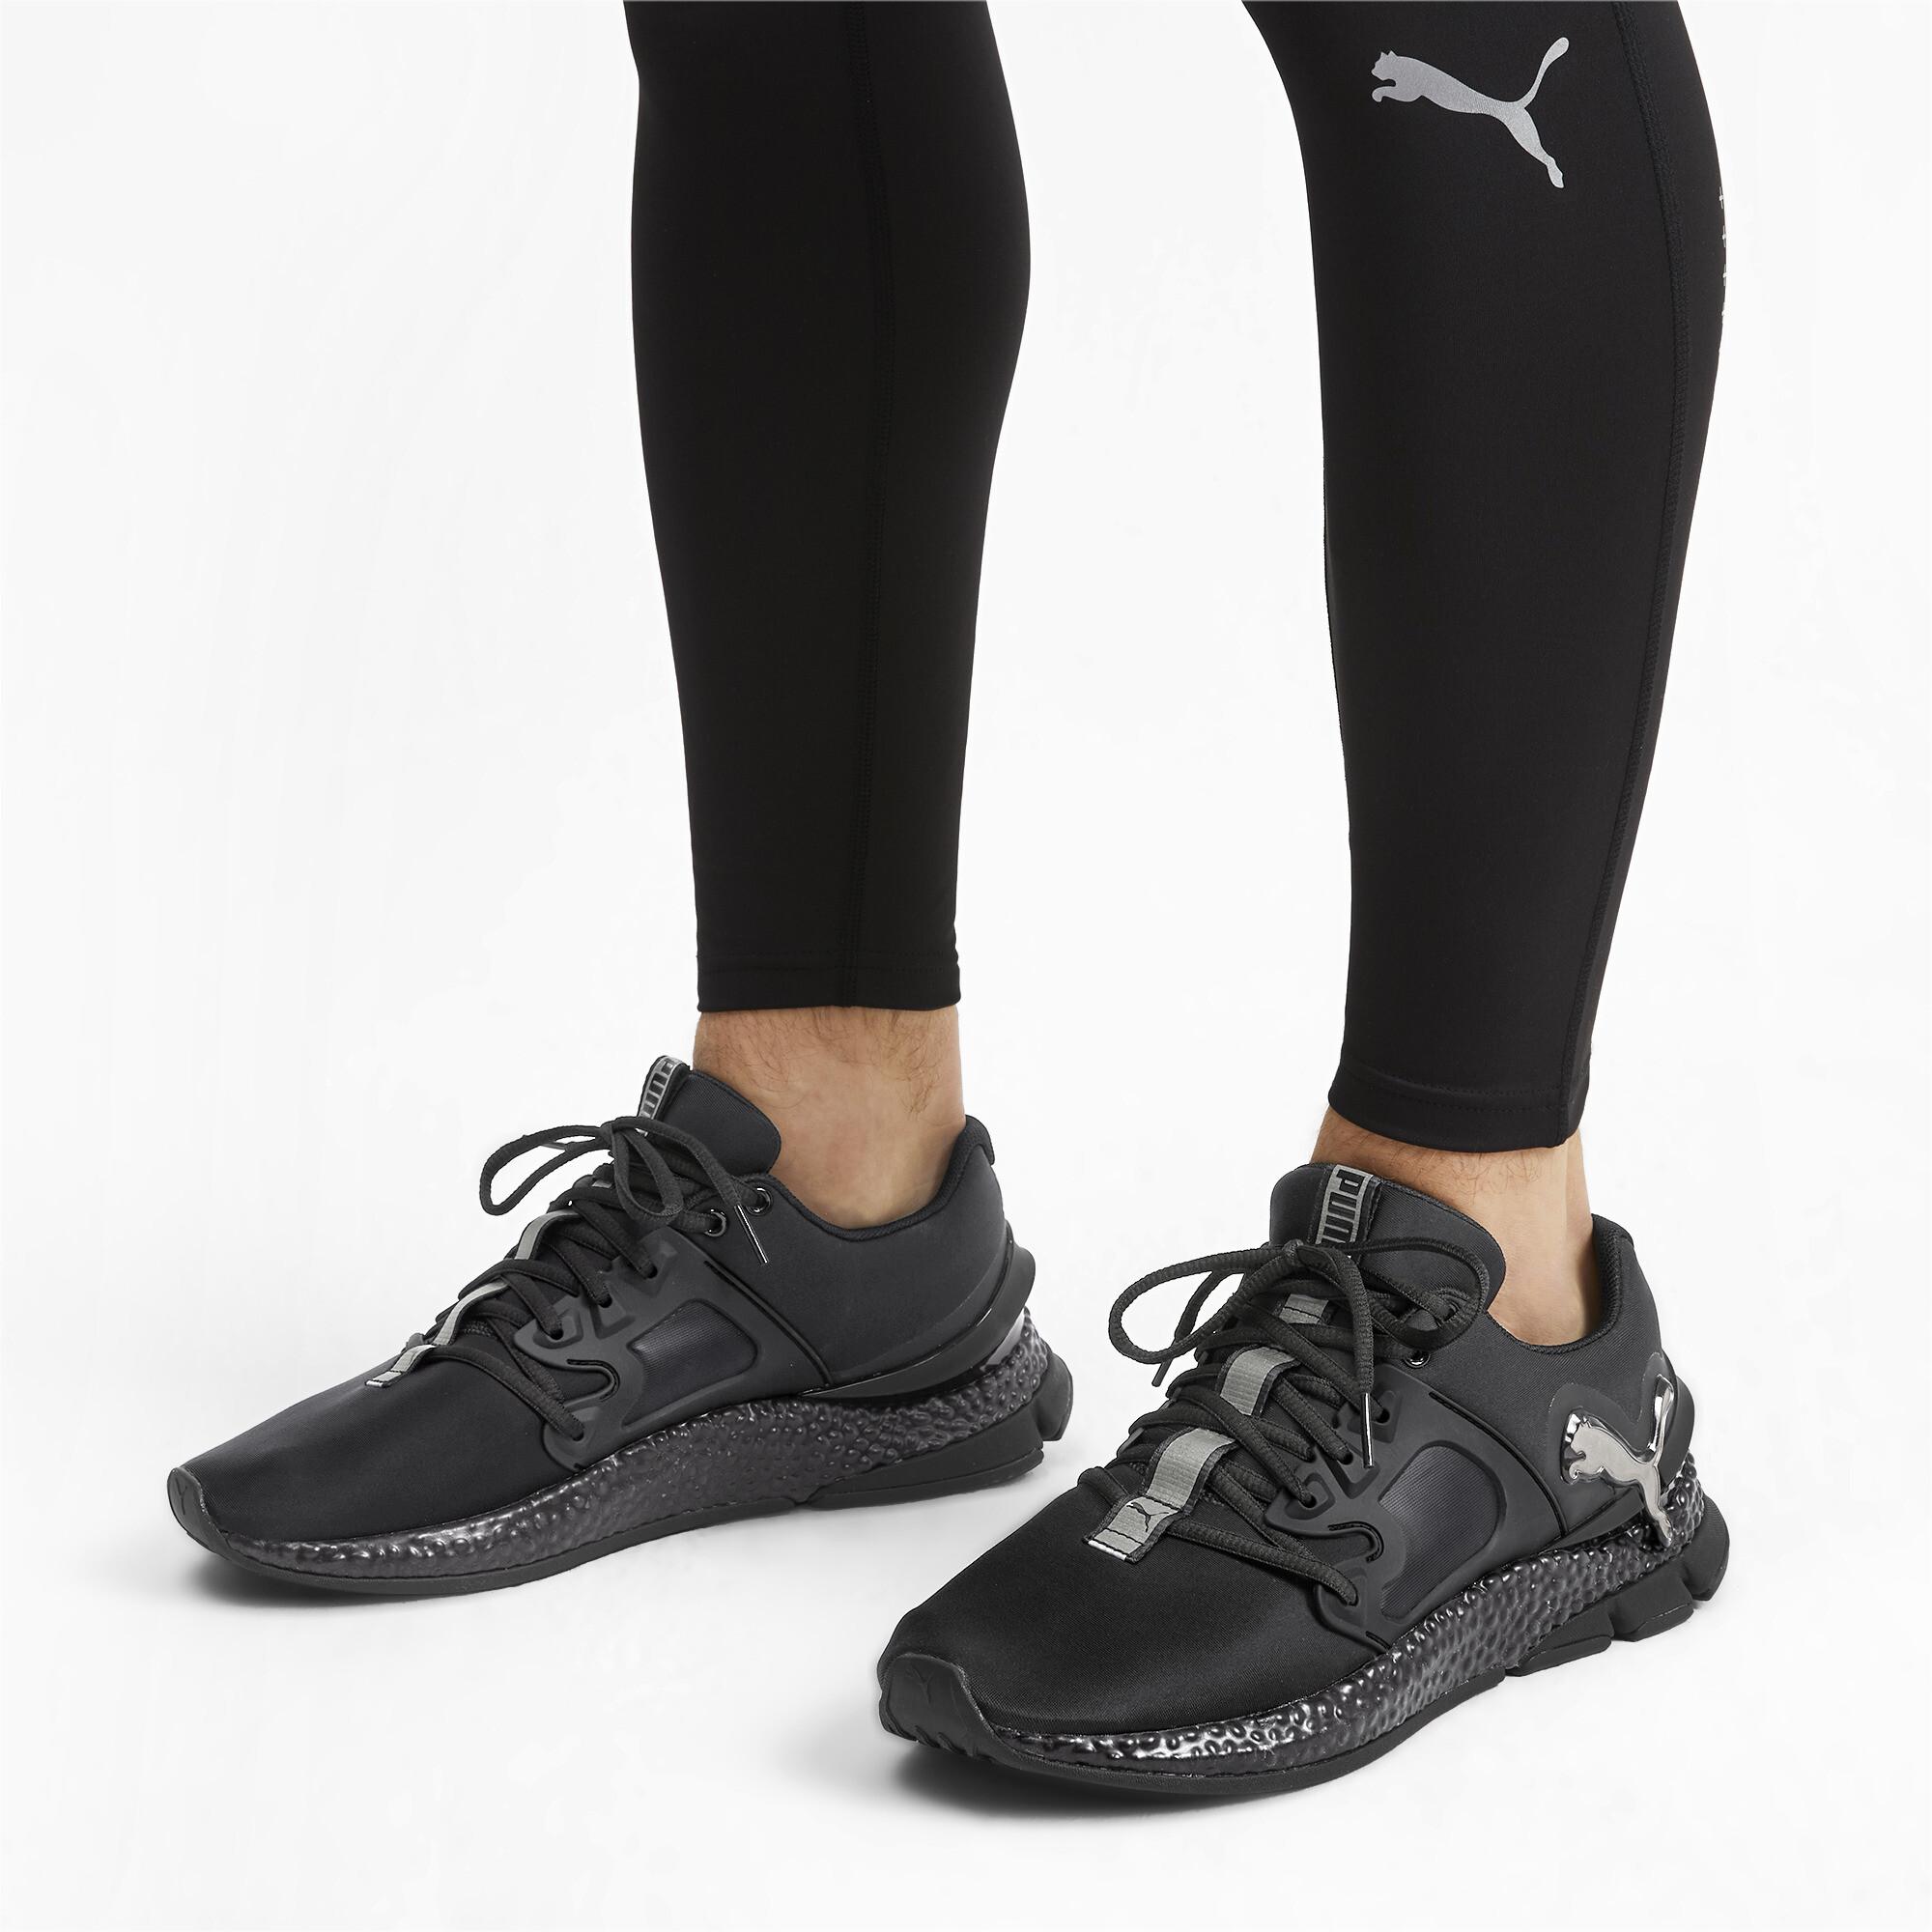 Details about PUMA Men's HYBRID Sky Rave Running Shoes